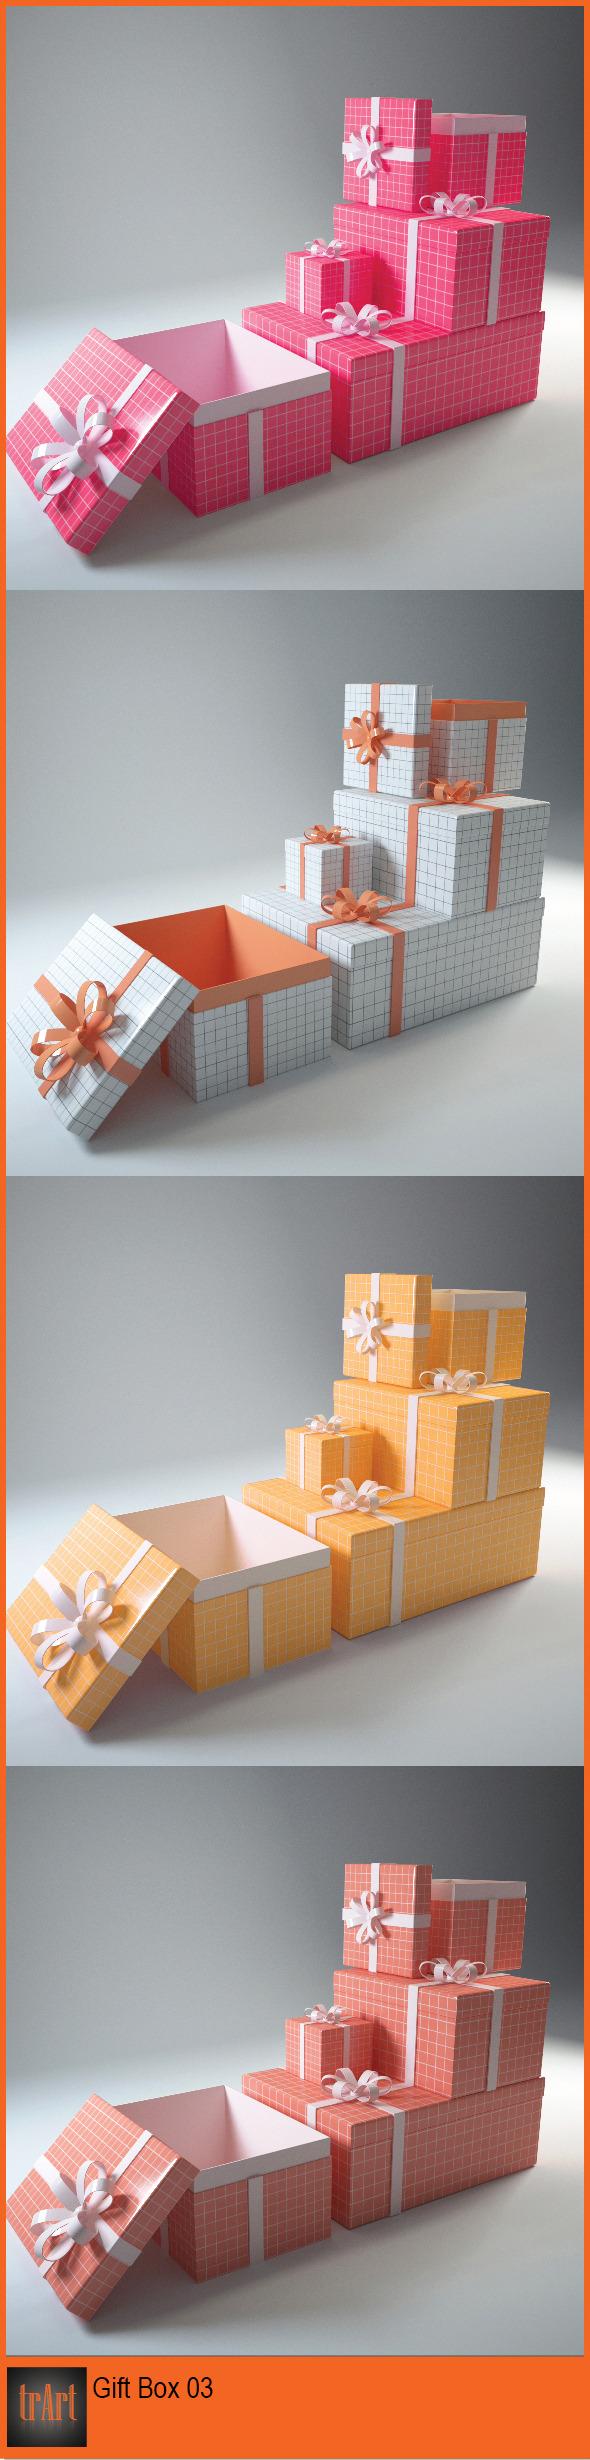 3DOcean Gift Box 6554180